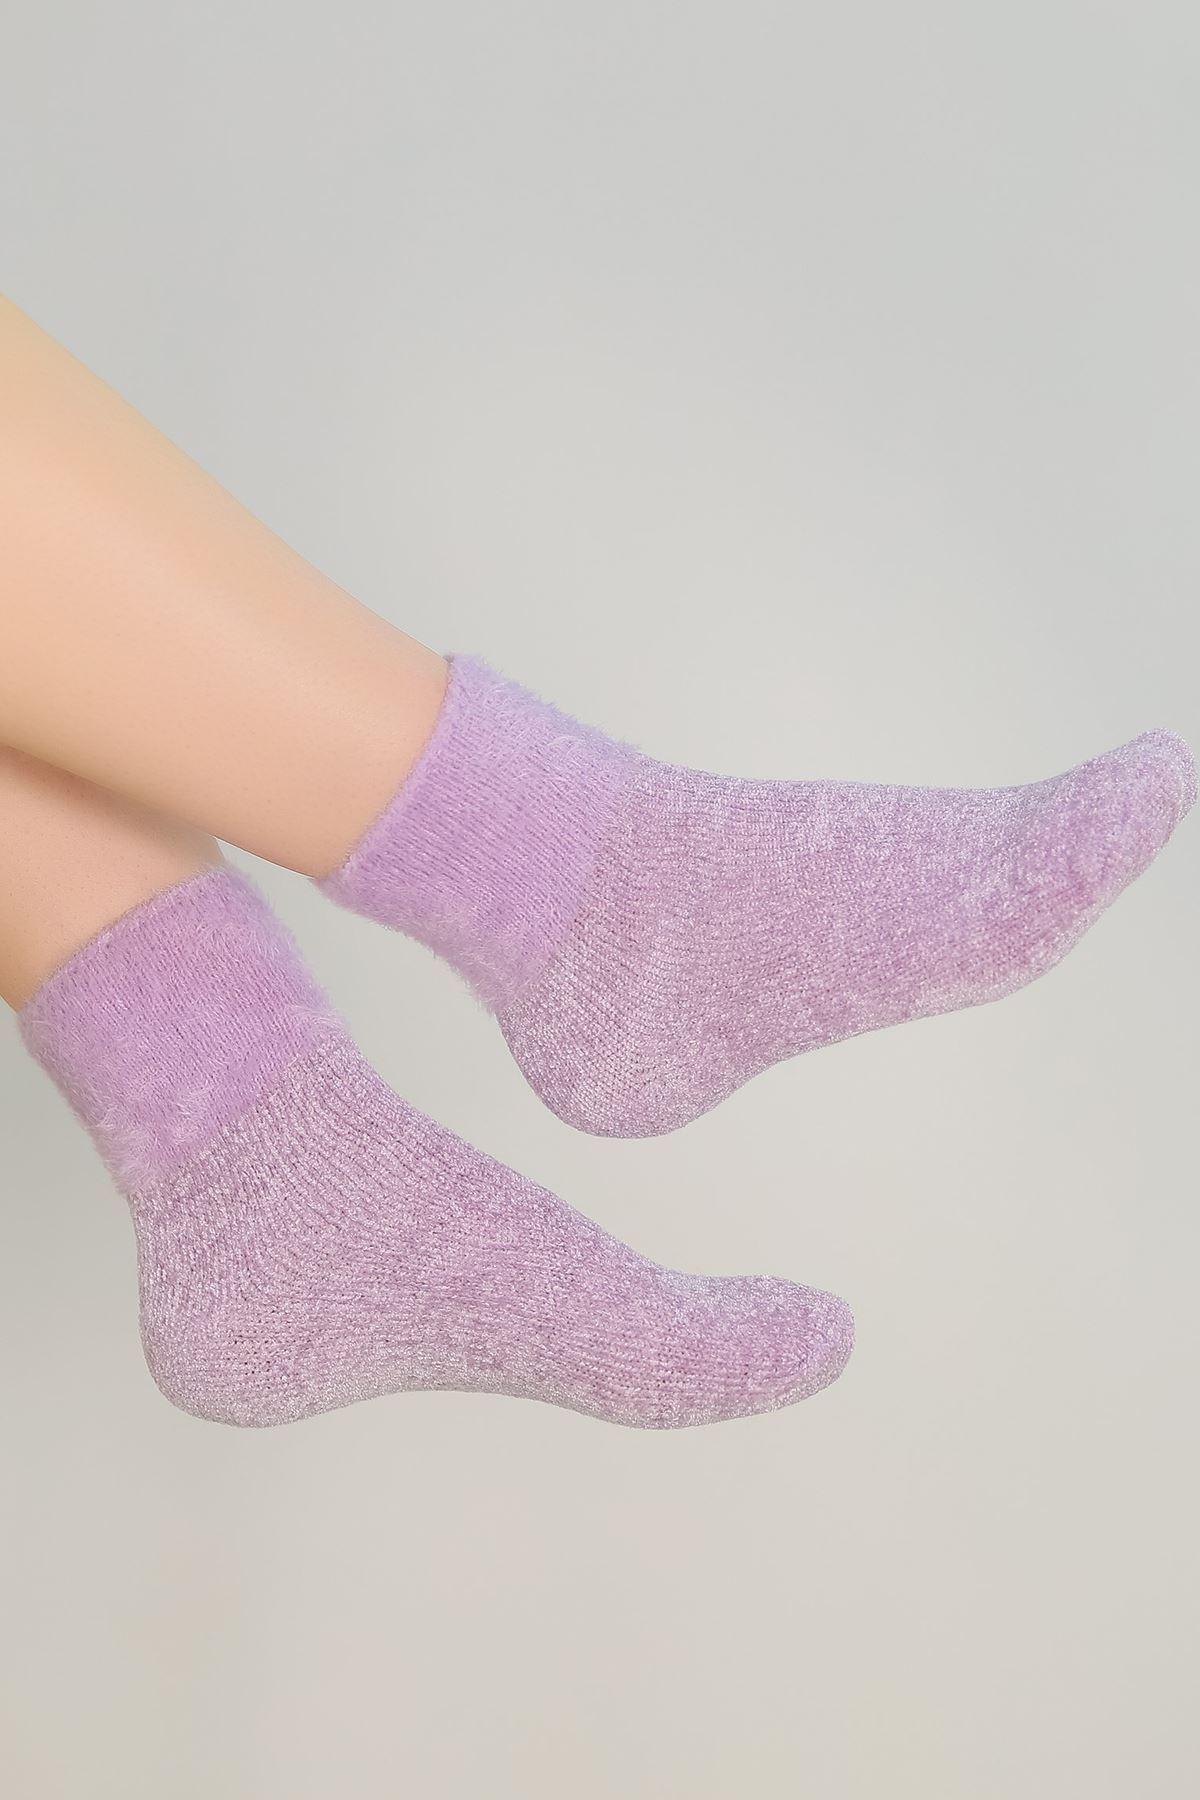 Renkli Bot Çorap Lila - 48300.1114.